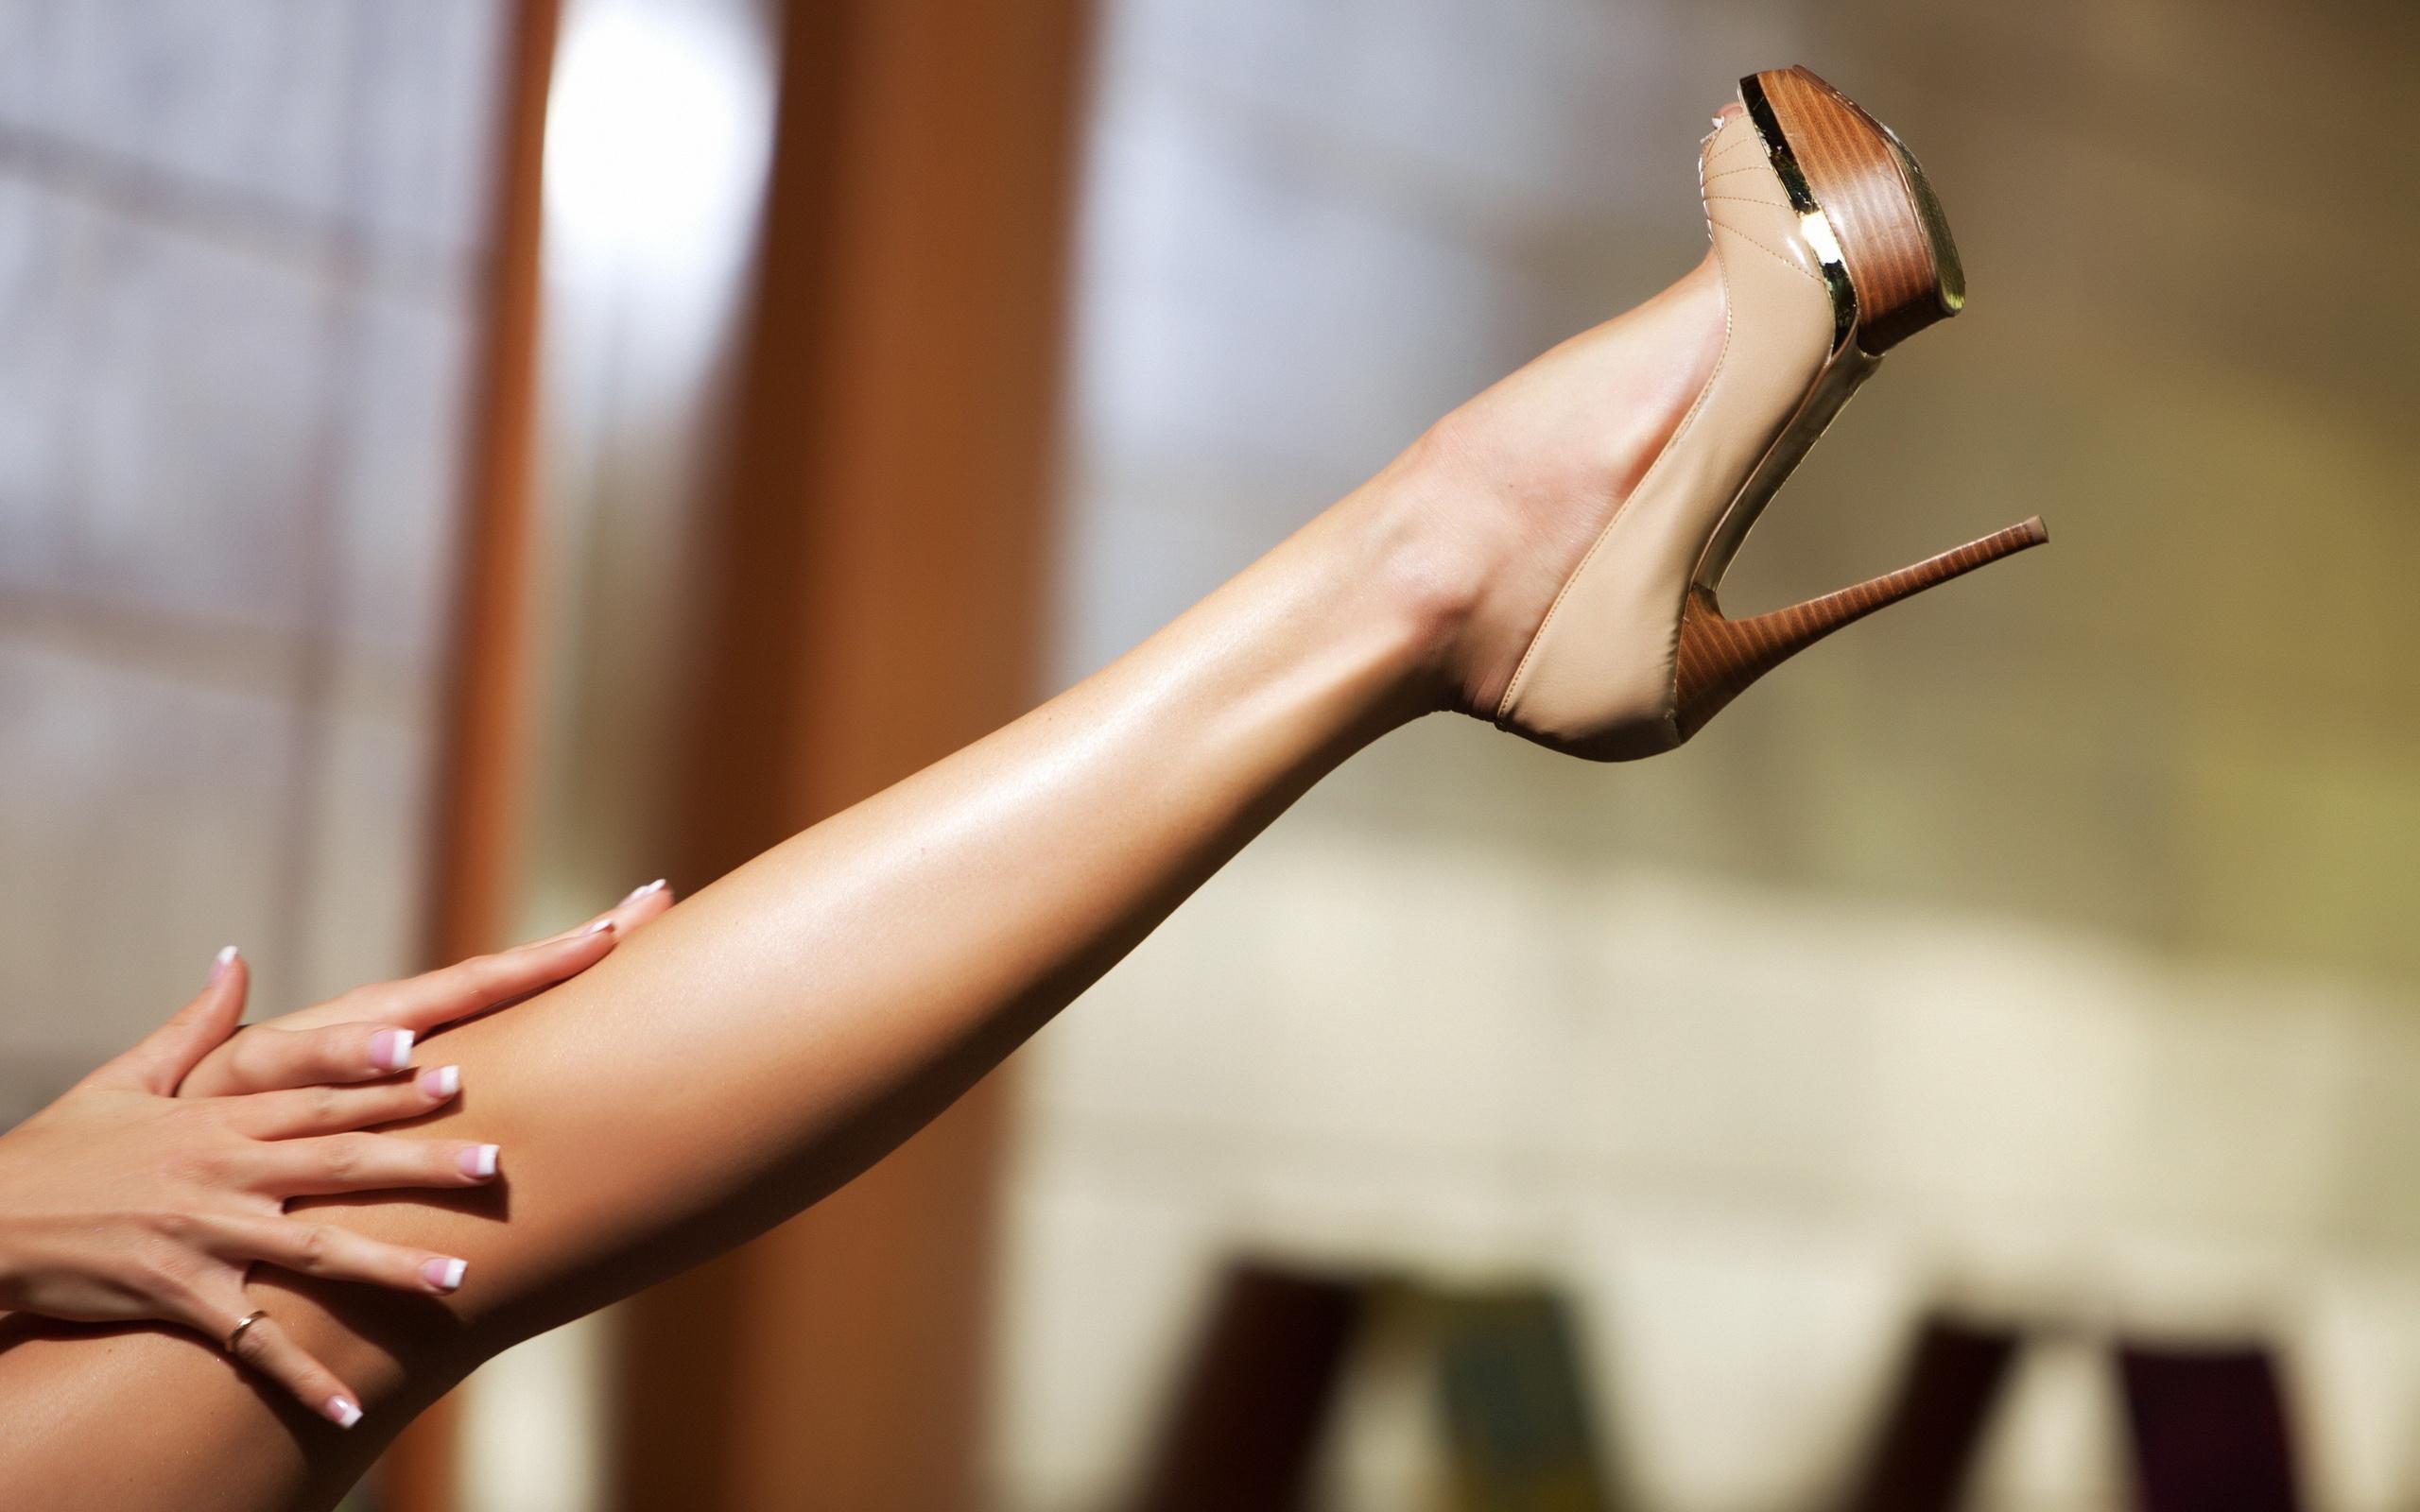 картинки с ногами на каблуках итоге возникают